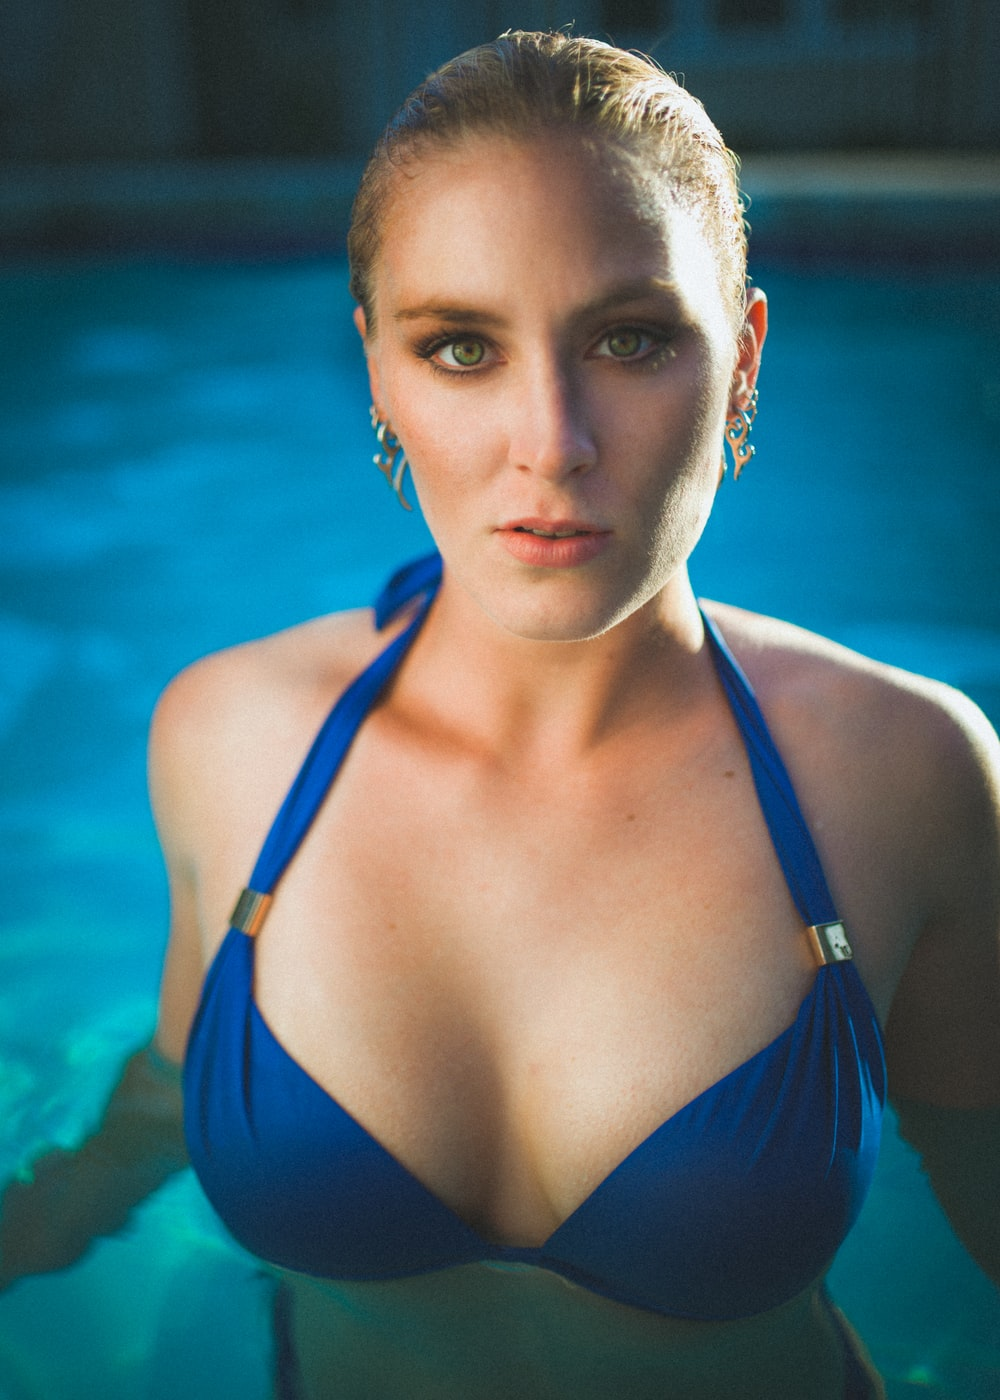 Free bikini girl, naughty pictures of women naked